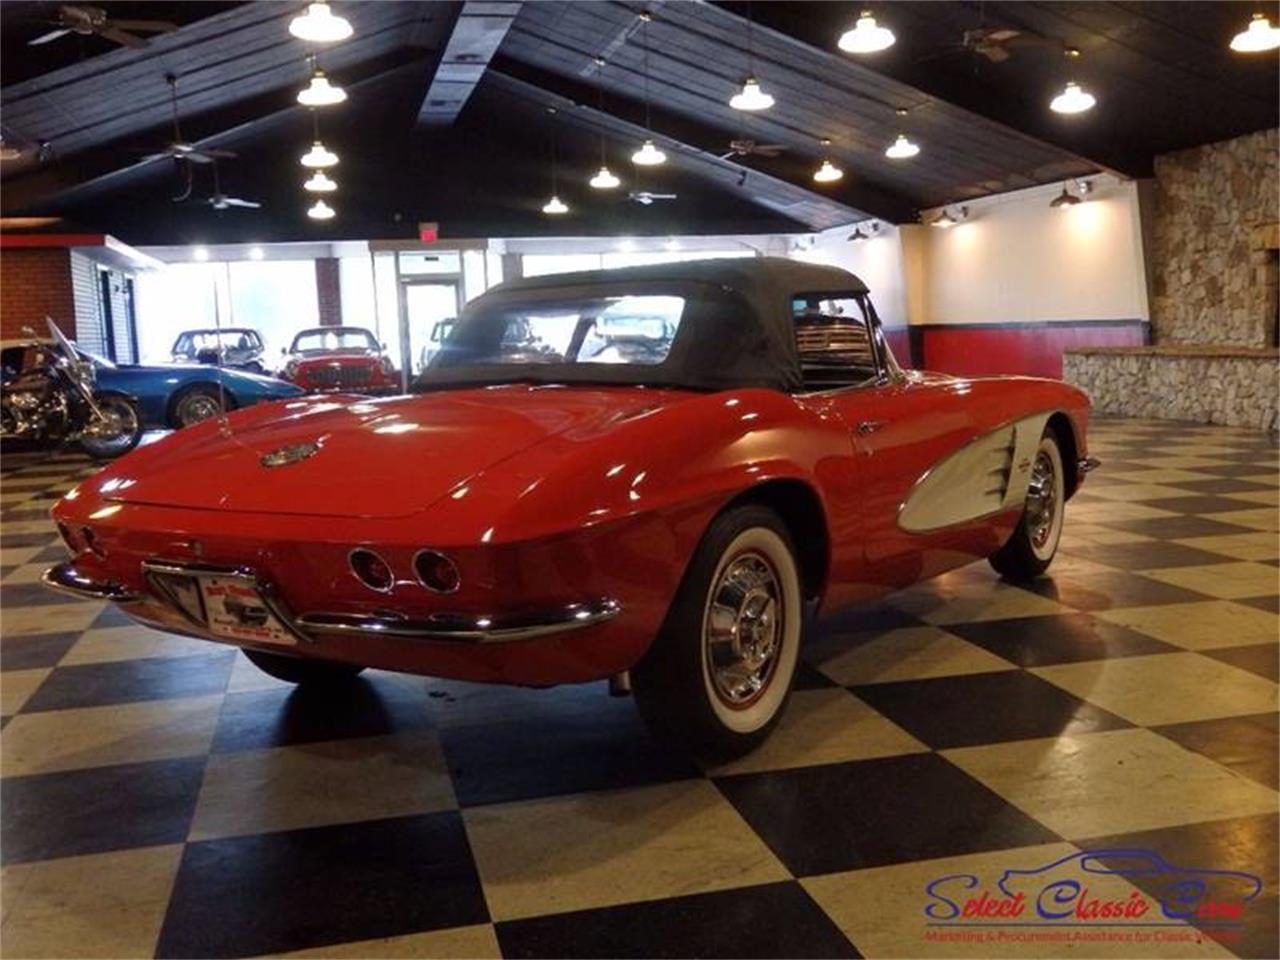 Large Picture of Classic 1961 Corvette located in Hiram Georgia - $69,500.00 - L521